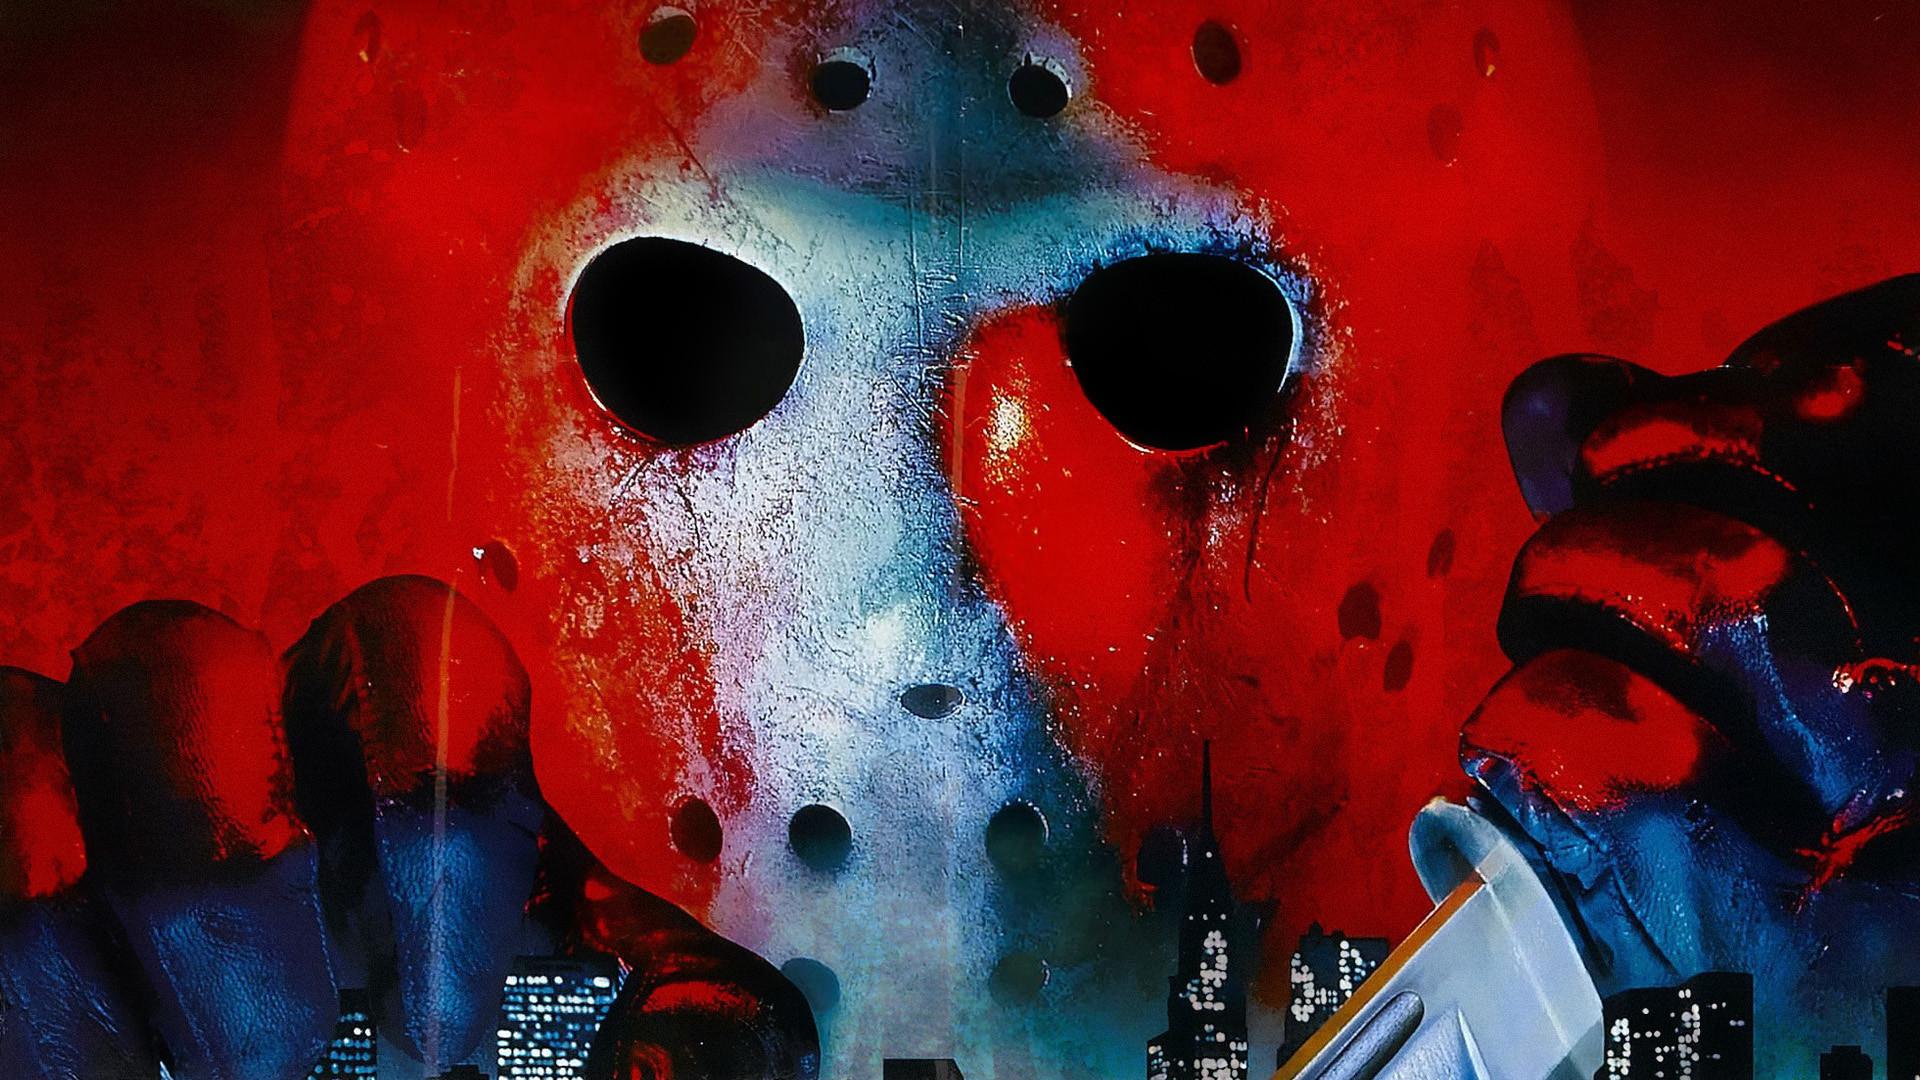 Res: 1920x1080, Movie - Friday the 13th Part VIII: Jason Takes Manhattan Wallpaper